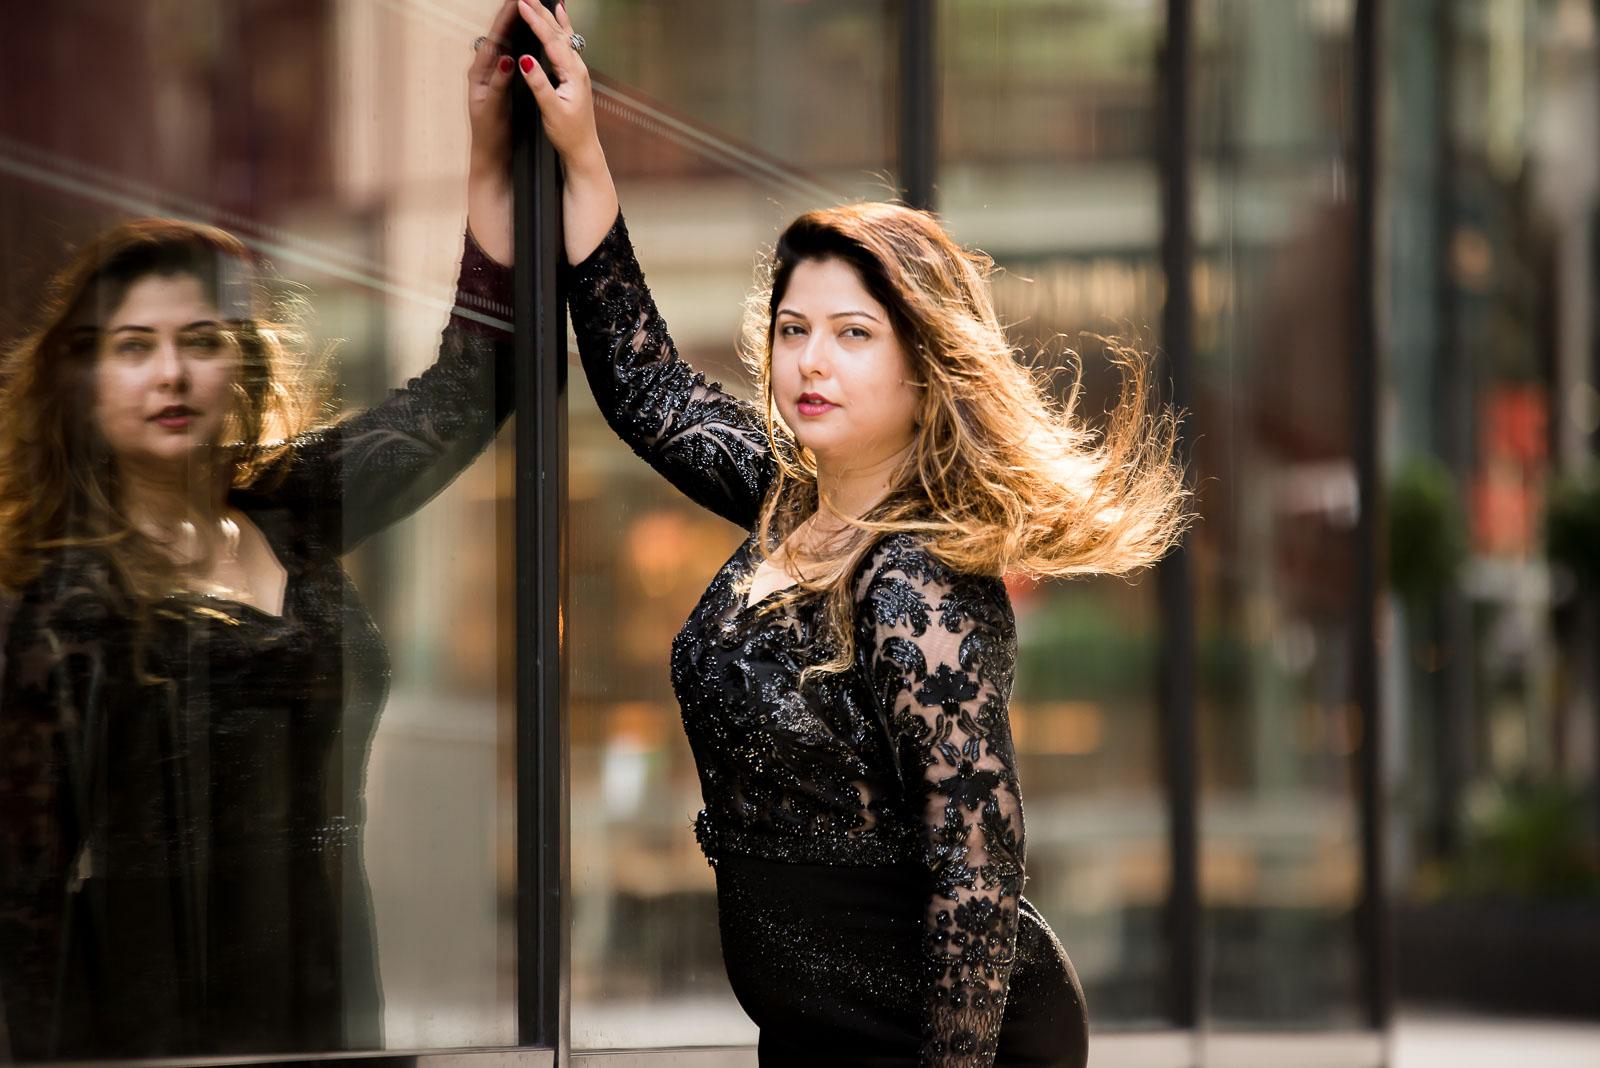 Lifestyle Fashion Photo session in London with Brighton & London Personal Brand Photographer - Magdalena Smolarska